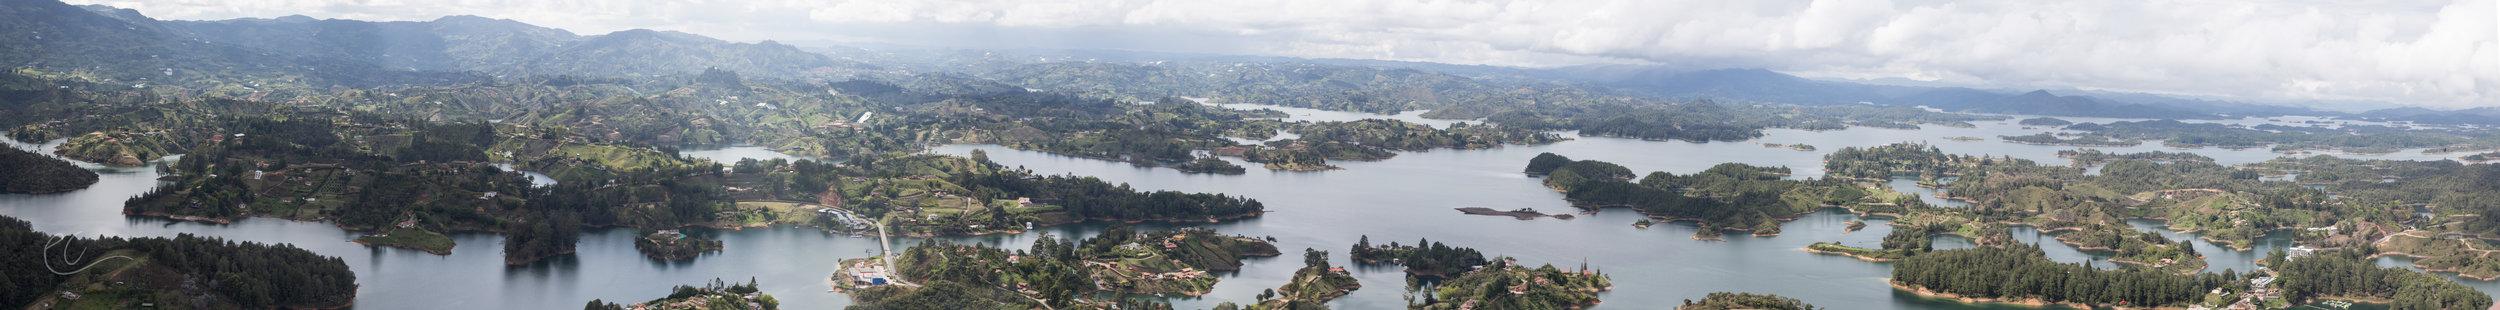 Colombia-204.jpg